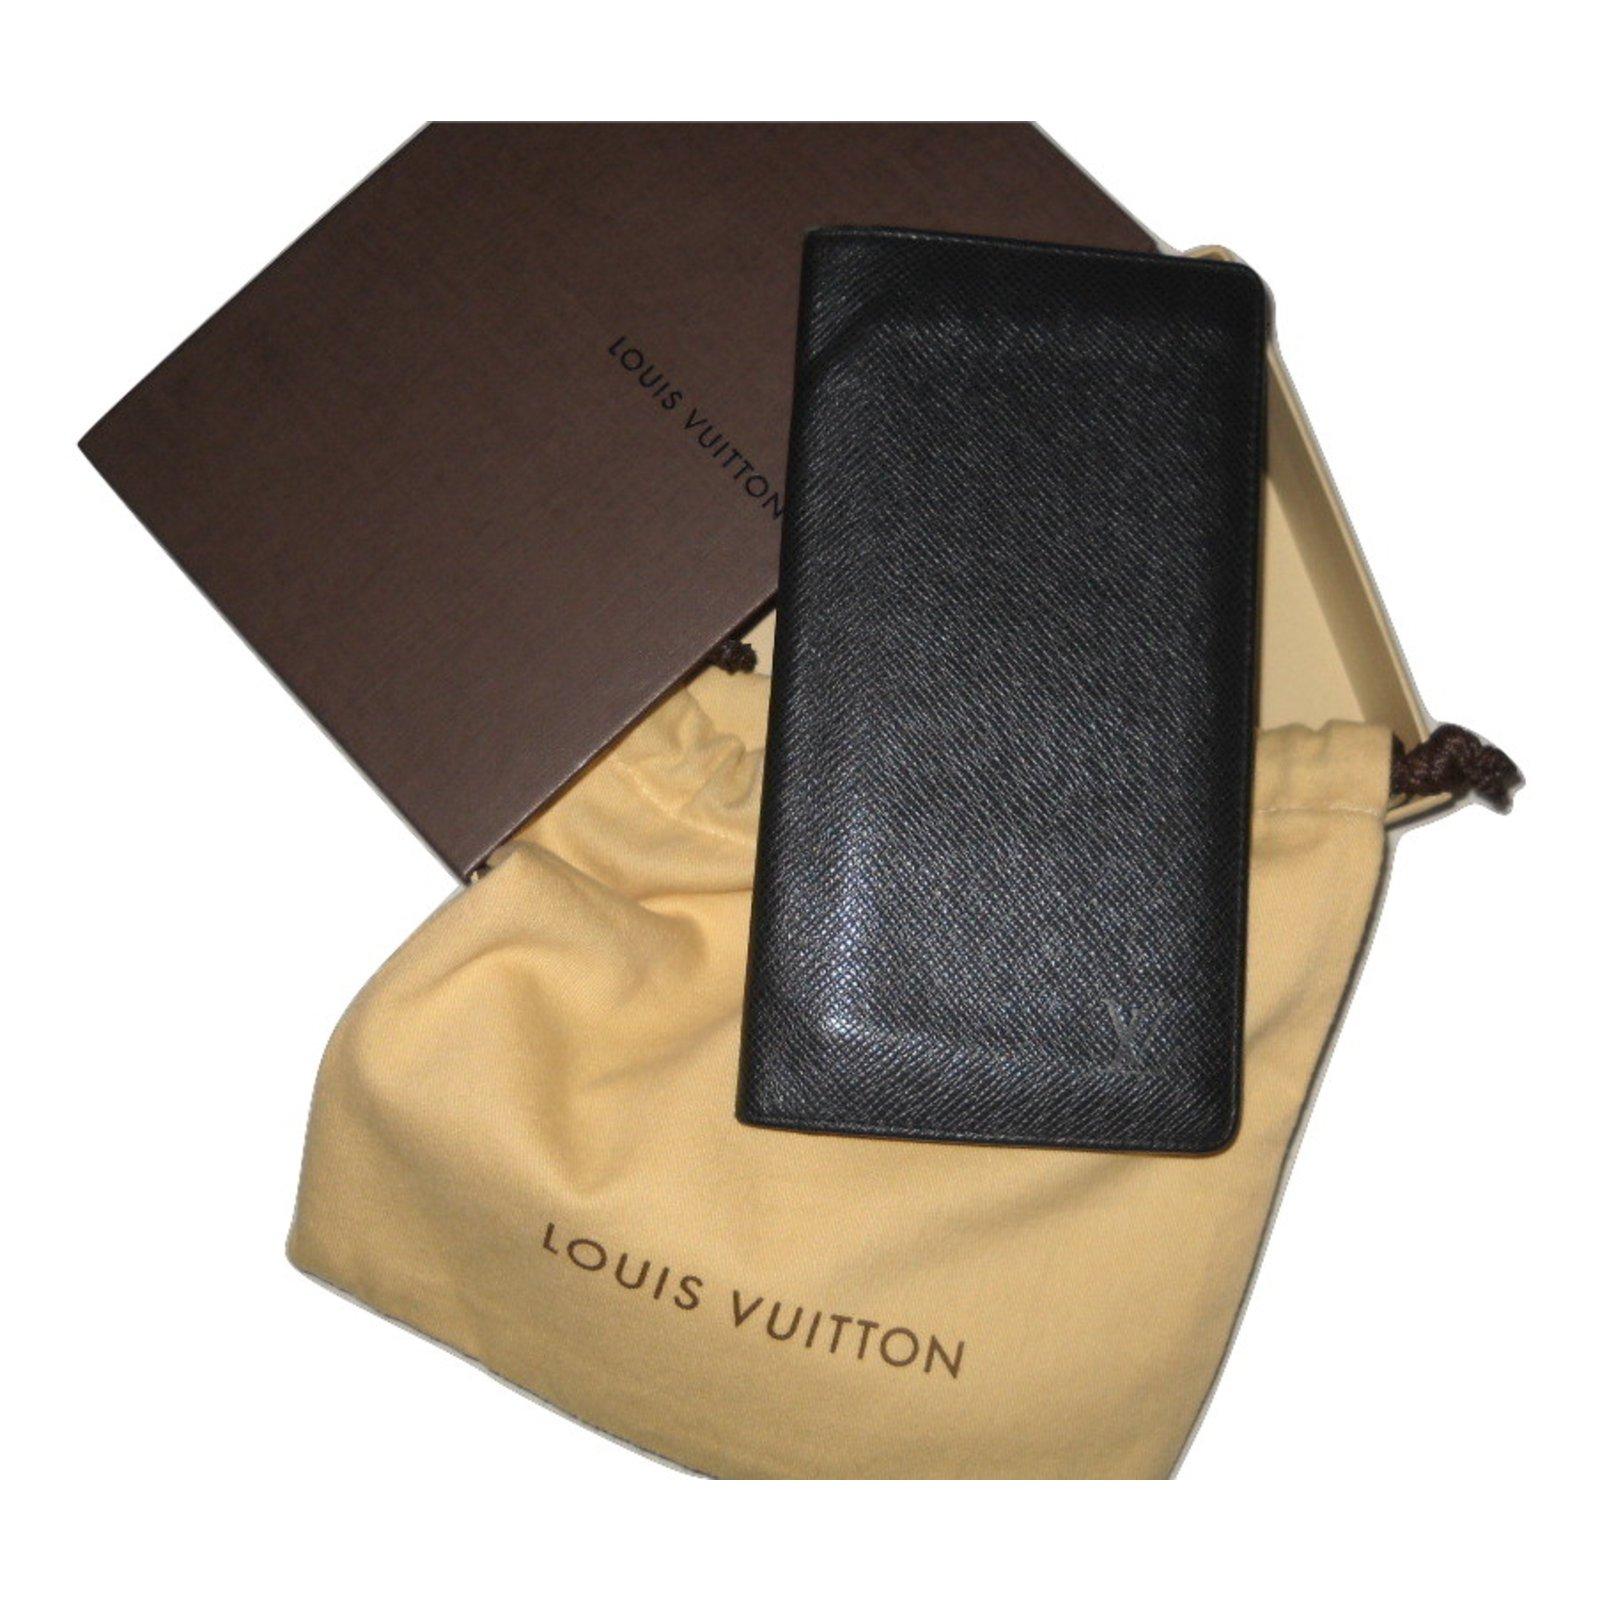 Petite maroquinerie homme louis vuitton portefeuille cuir taiga cuir gris joli closet - Porte carte homme louis vuitton ...